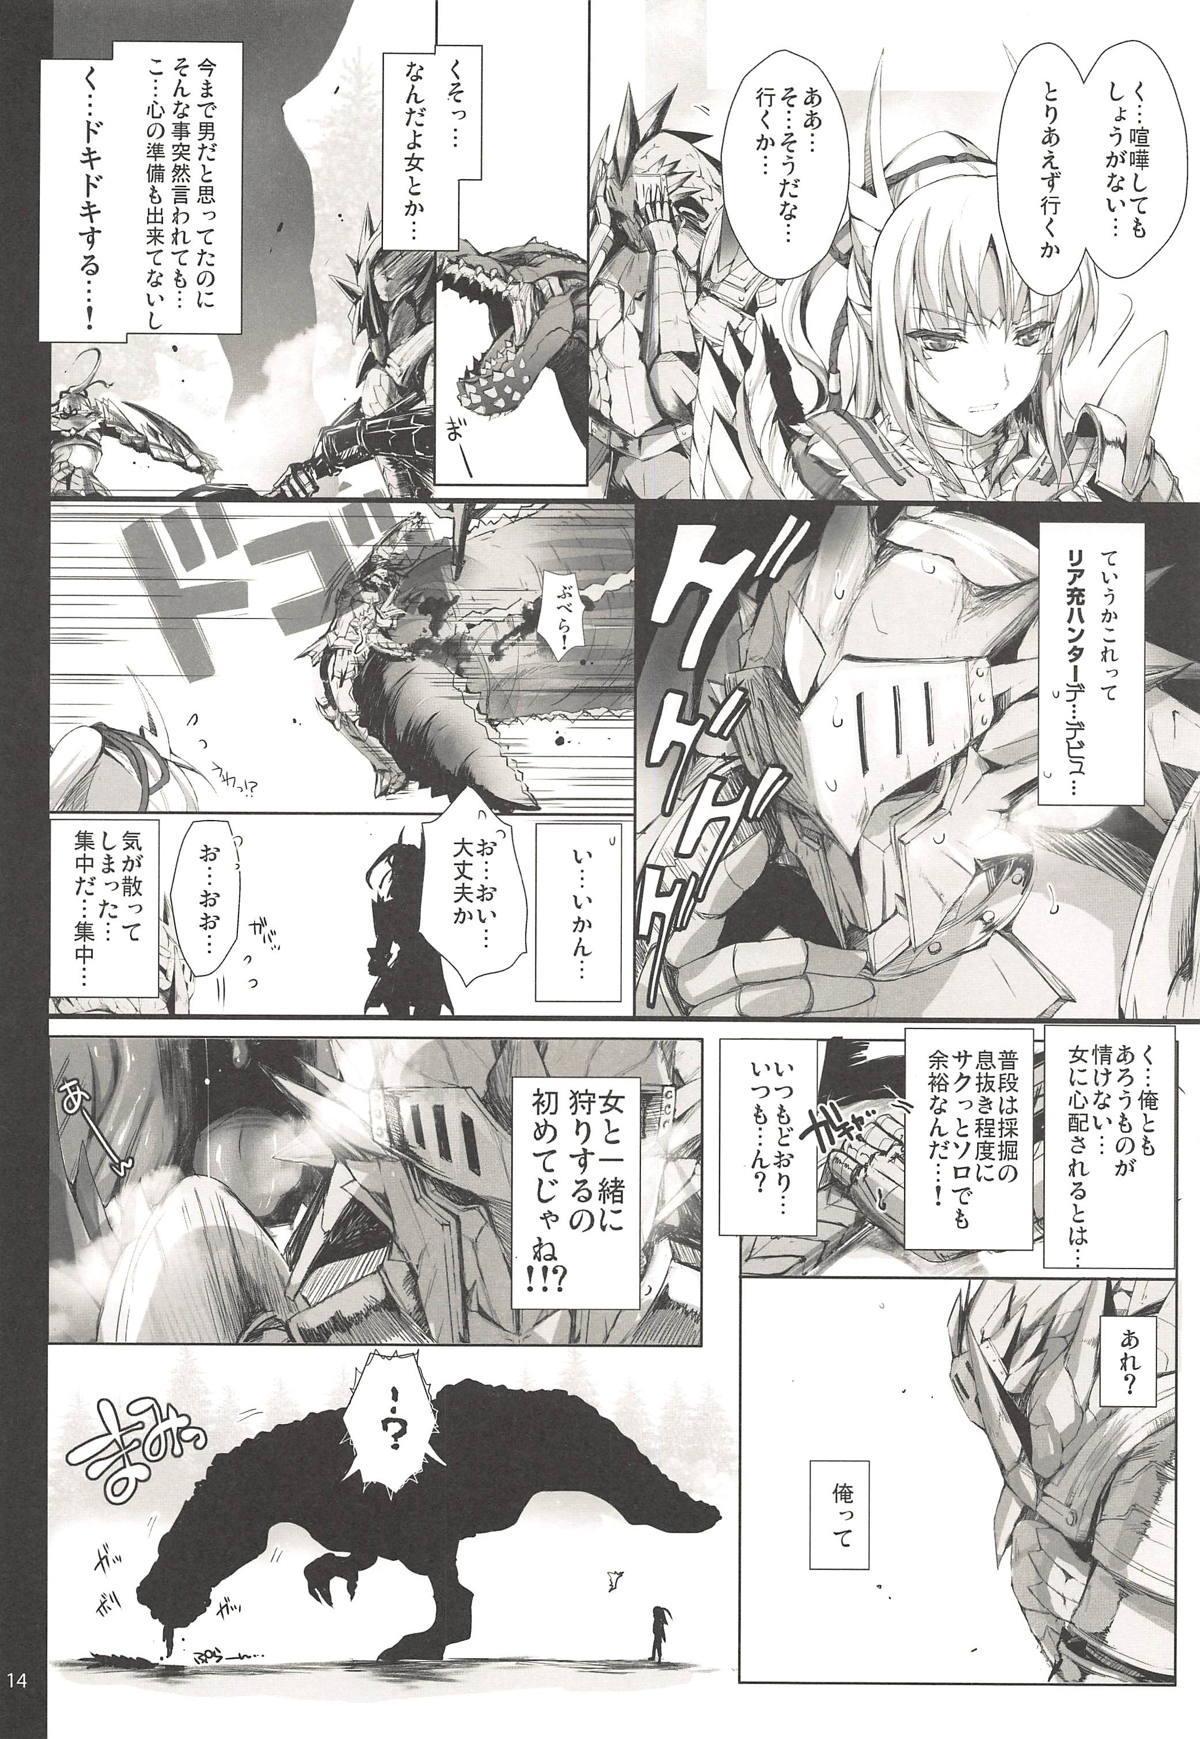 Monhan no Erohon G3 11→14+Juuhi+Omakebon Soushuuhen 13